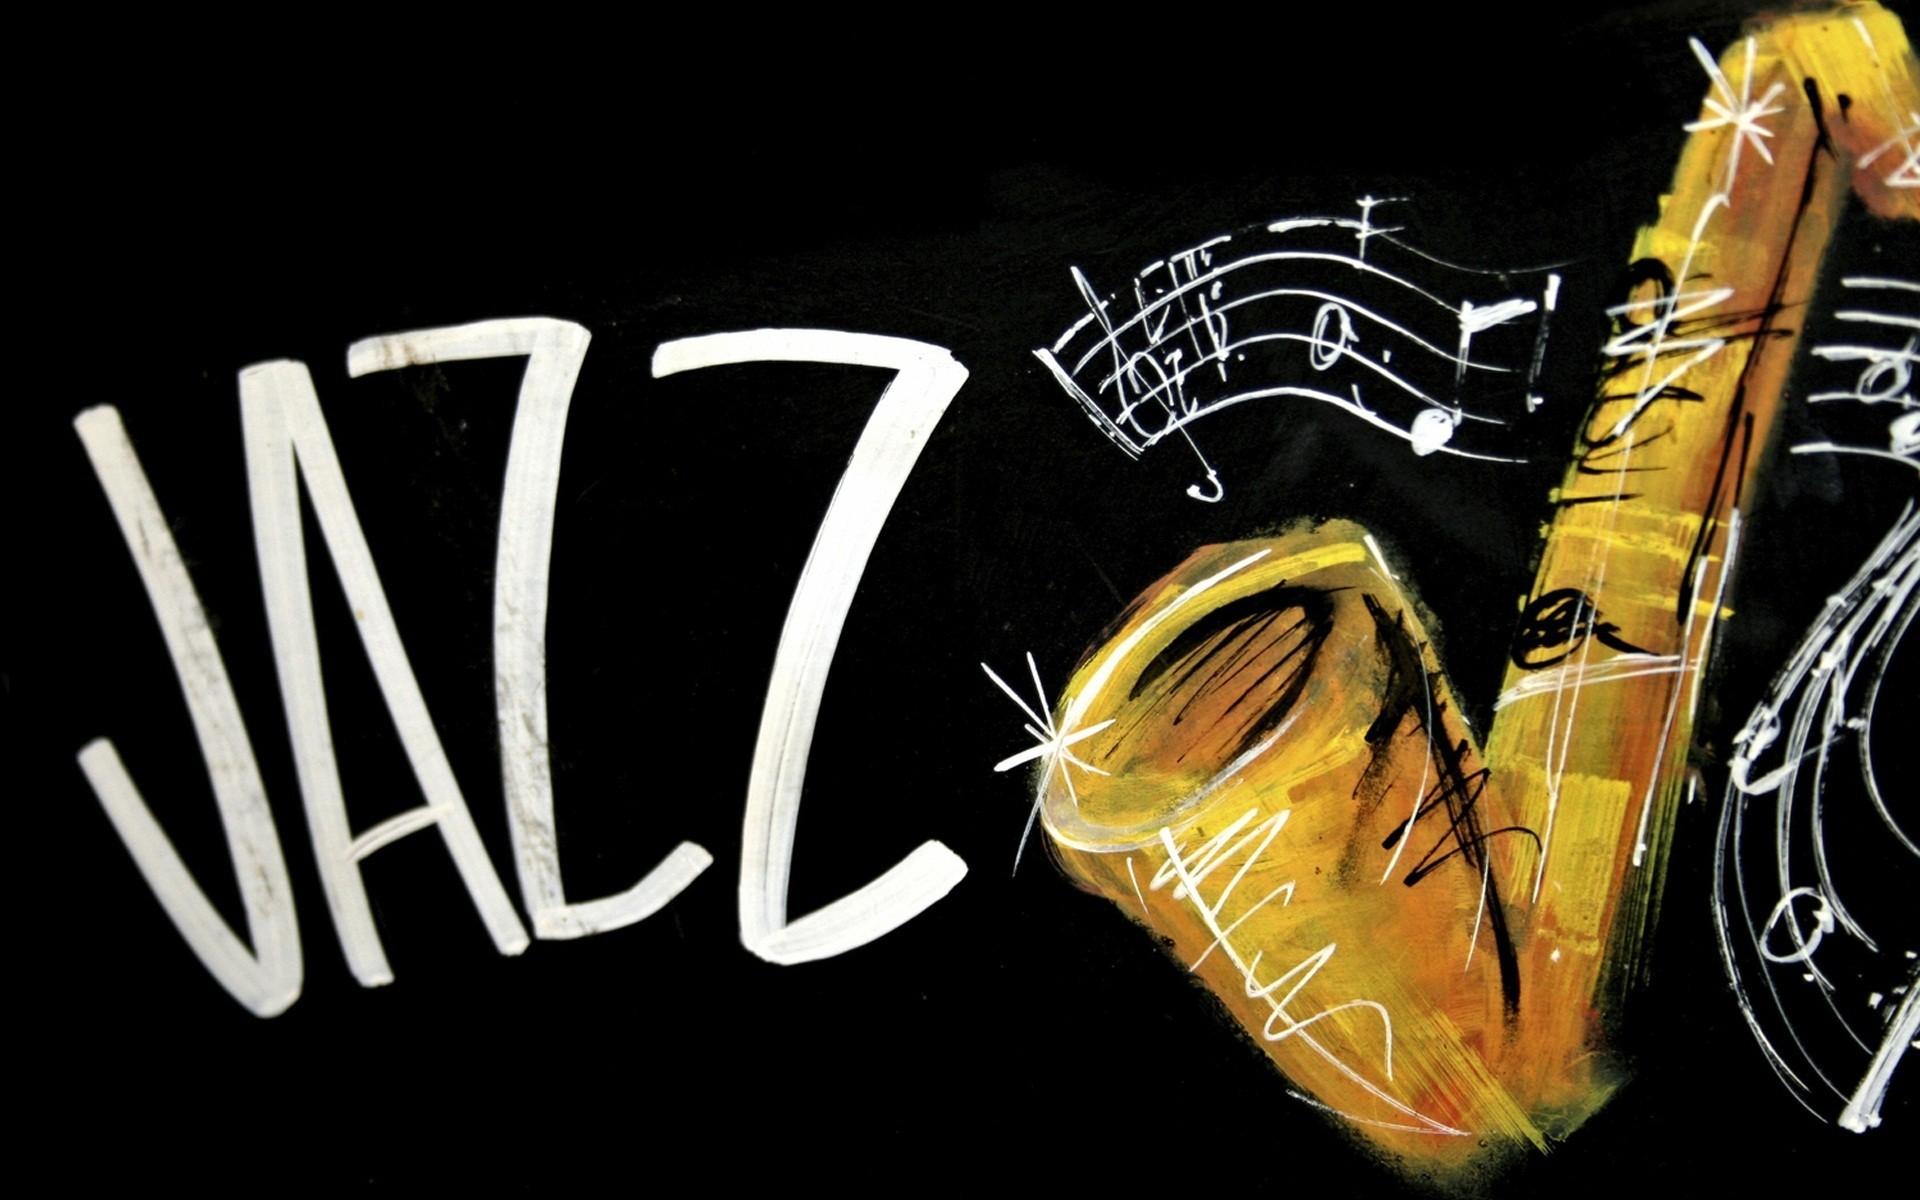 Les Samedi soir : Concert de Jazz